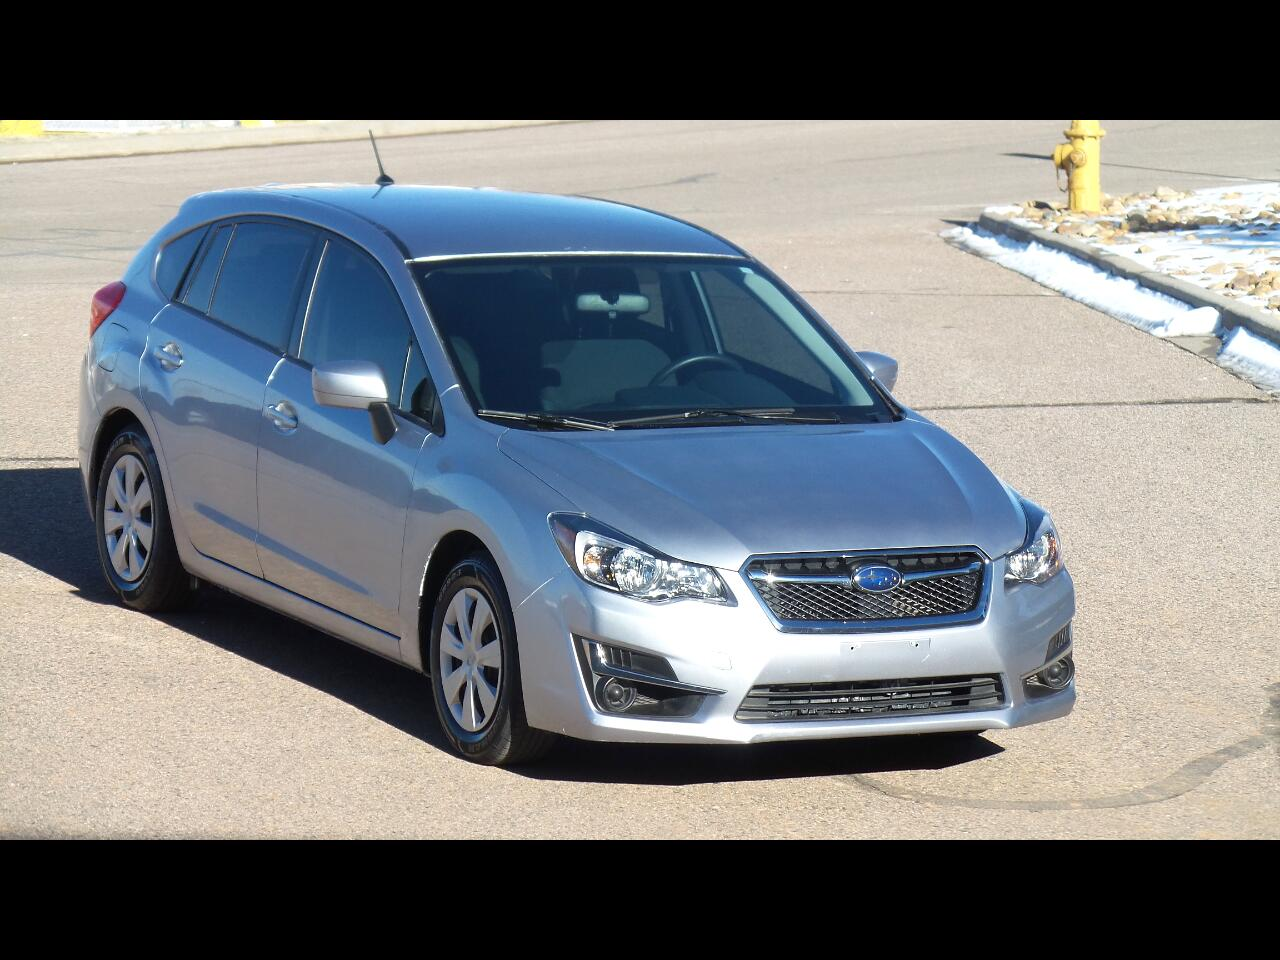 2016 Subaru Impreza 2.0i PZEV 5M 5-Door